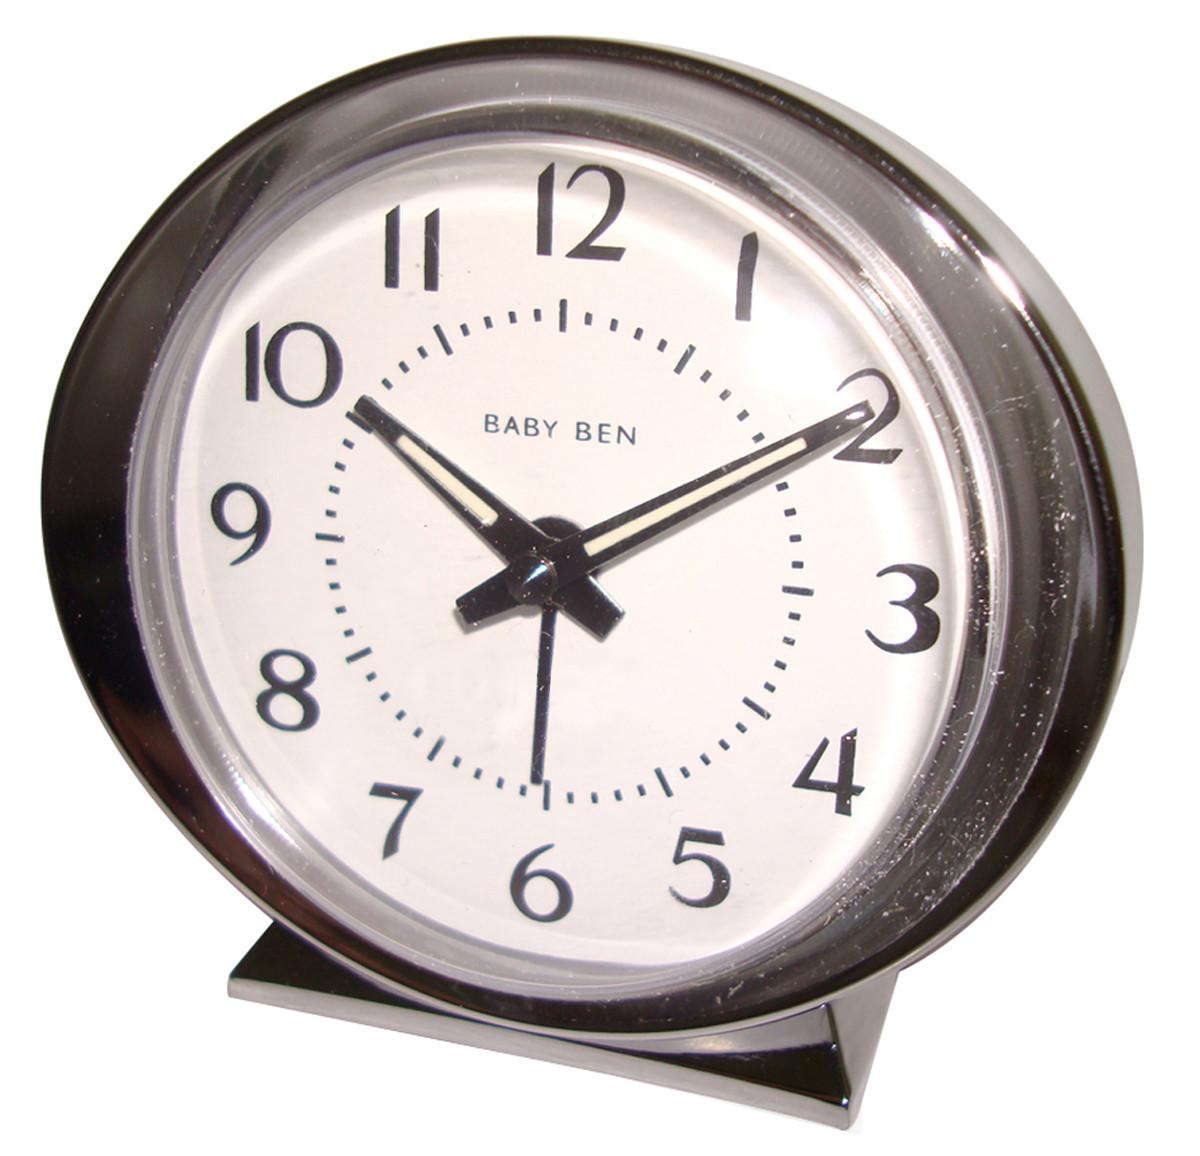 Westclox 1964 Baby Ben Classic Analog Battery Alarm Clock Ivory 11611QA